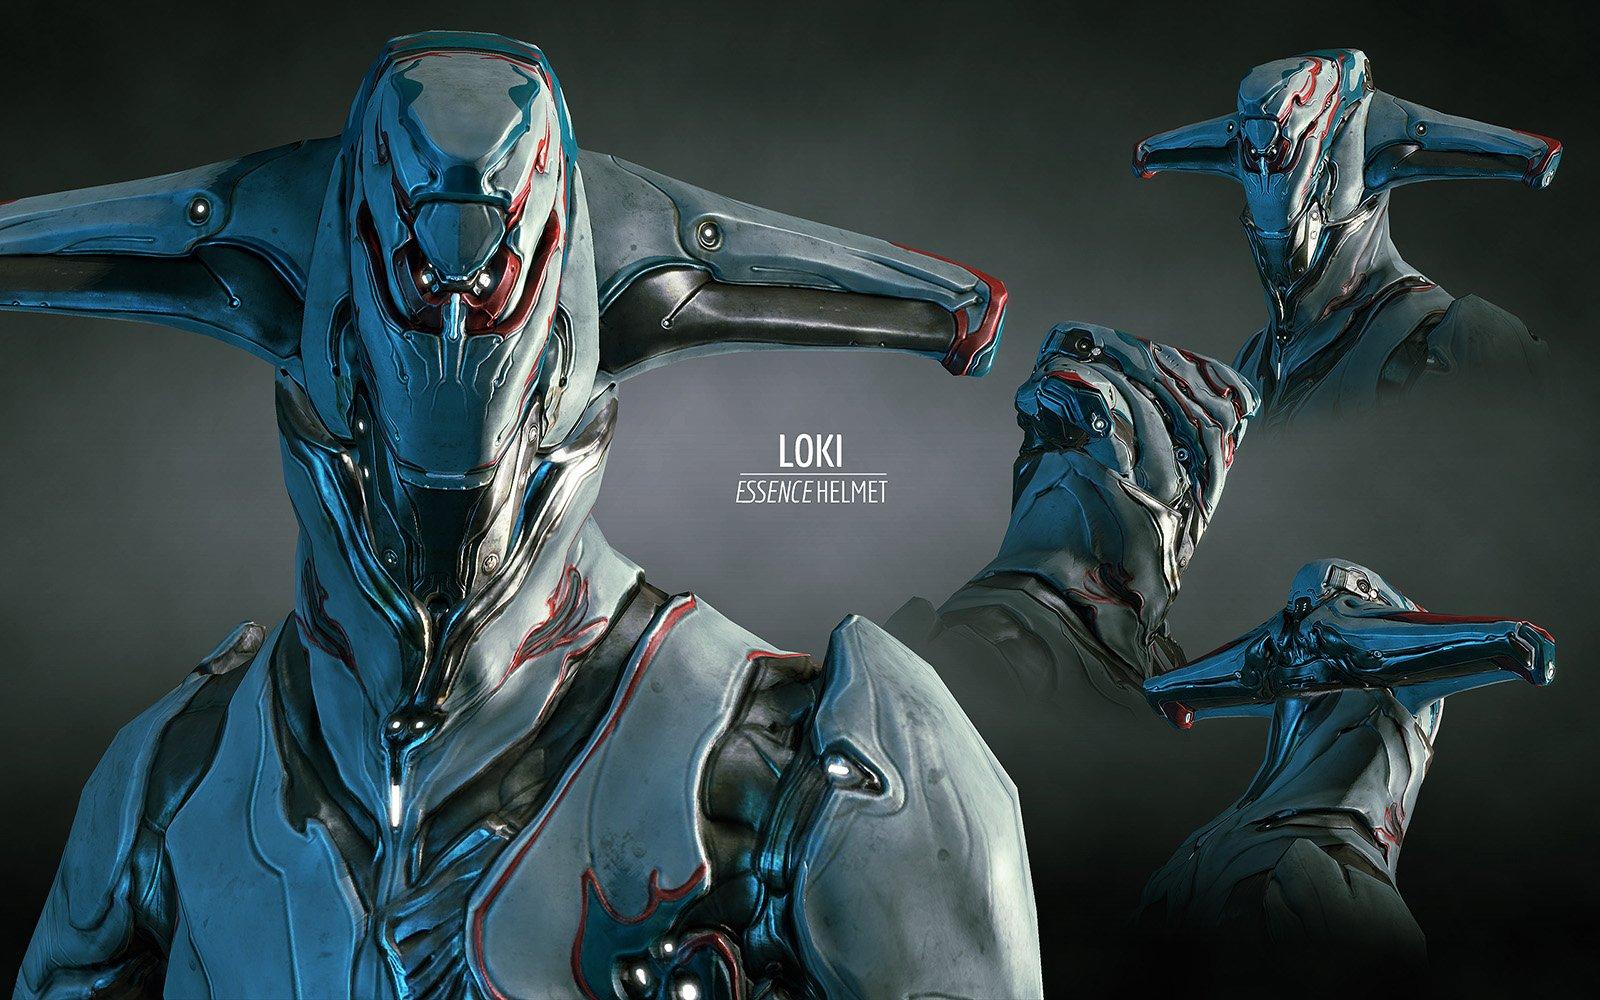 Warframe Loki sci fi wallpaper 1600x1000 248110 WallpaperUP 1600x1000